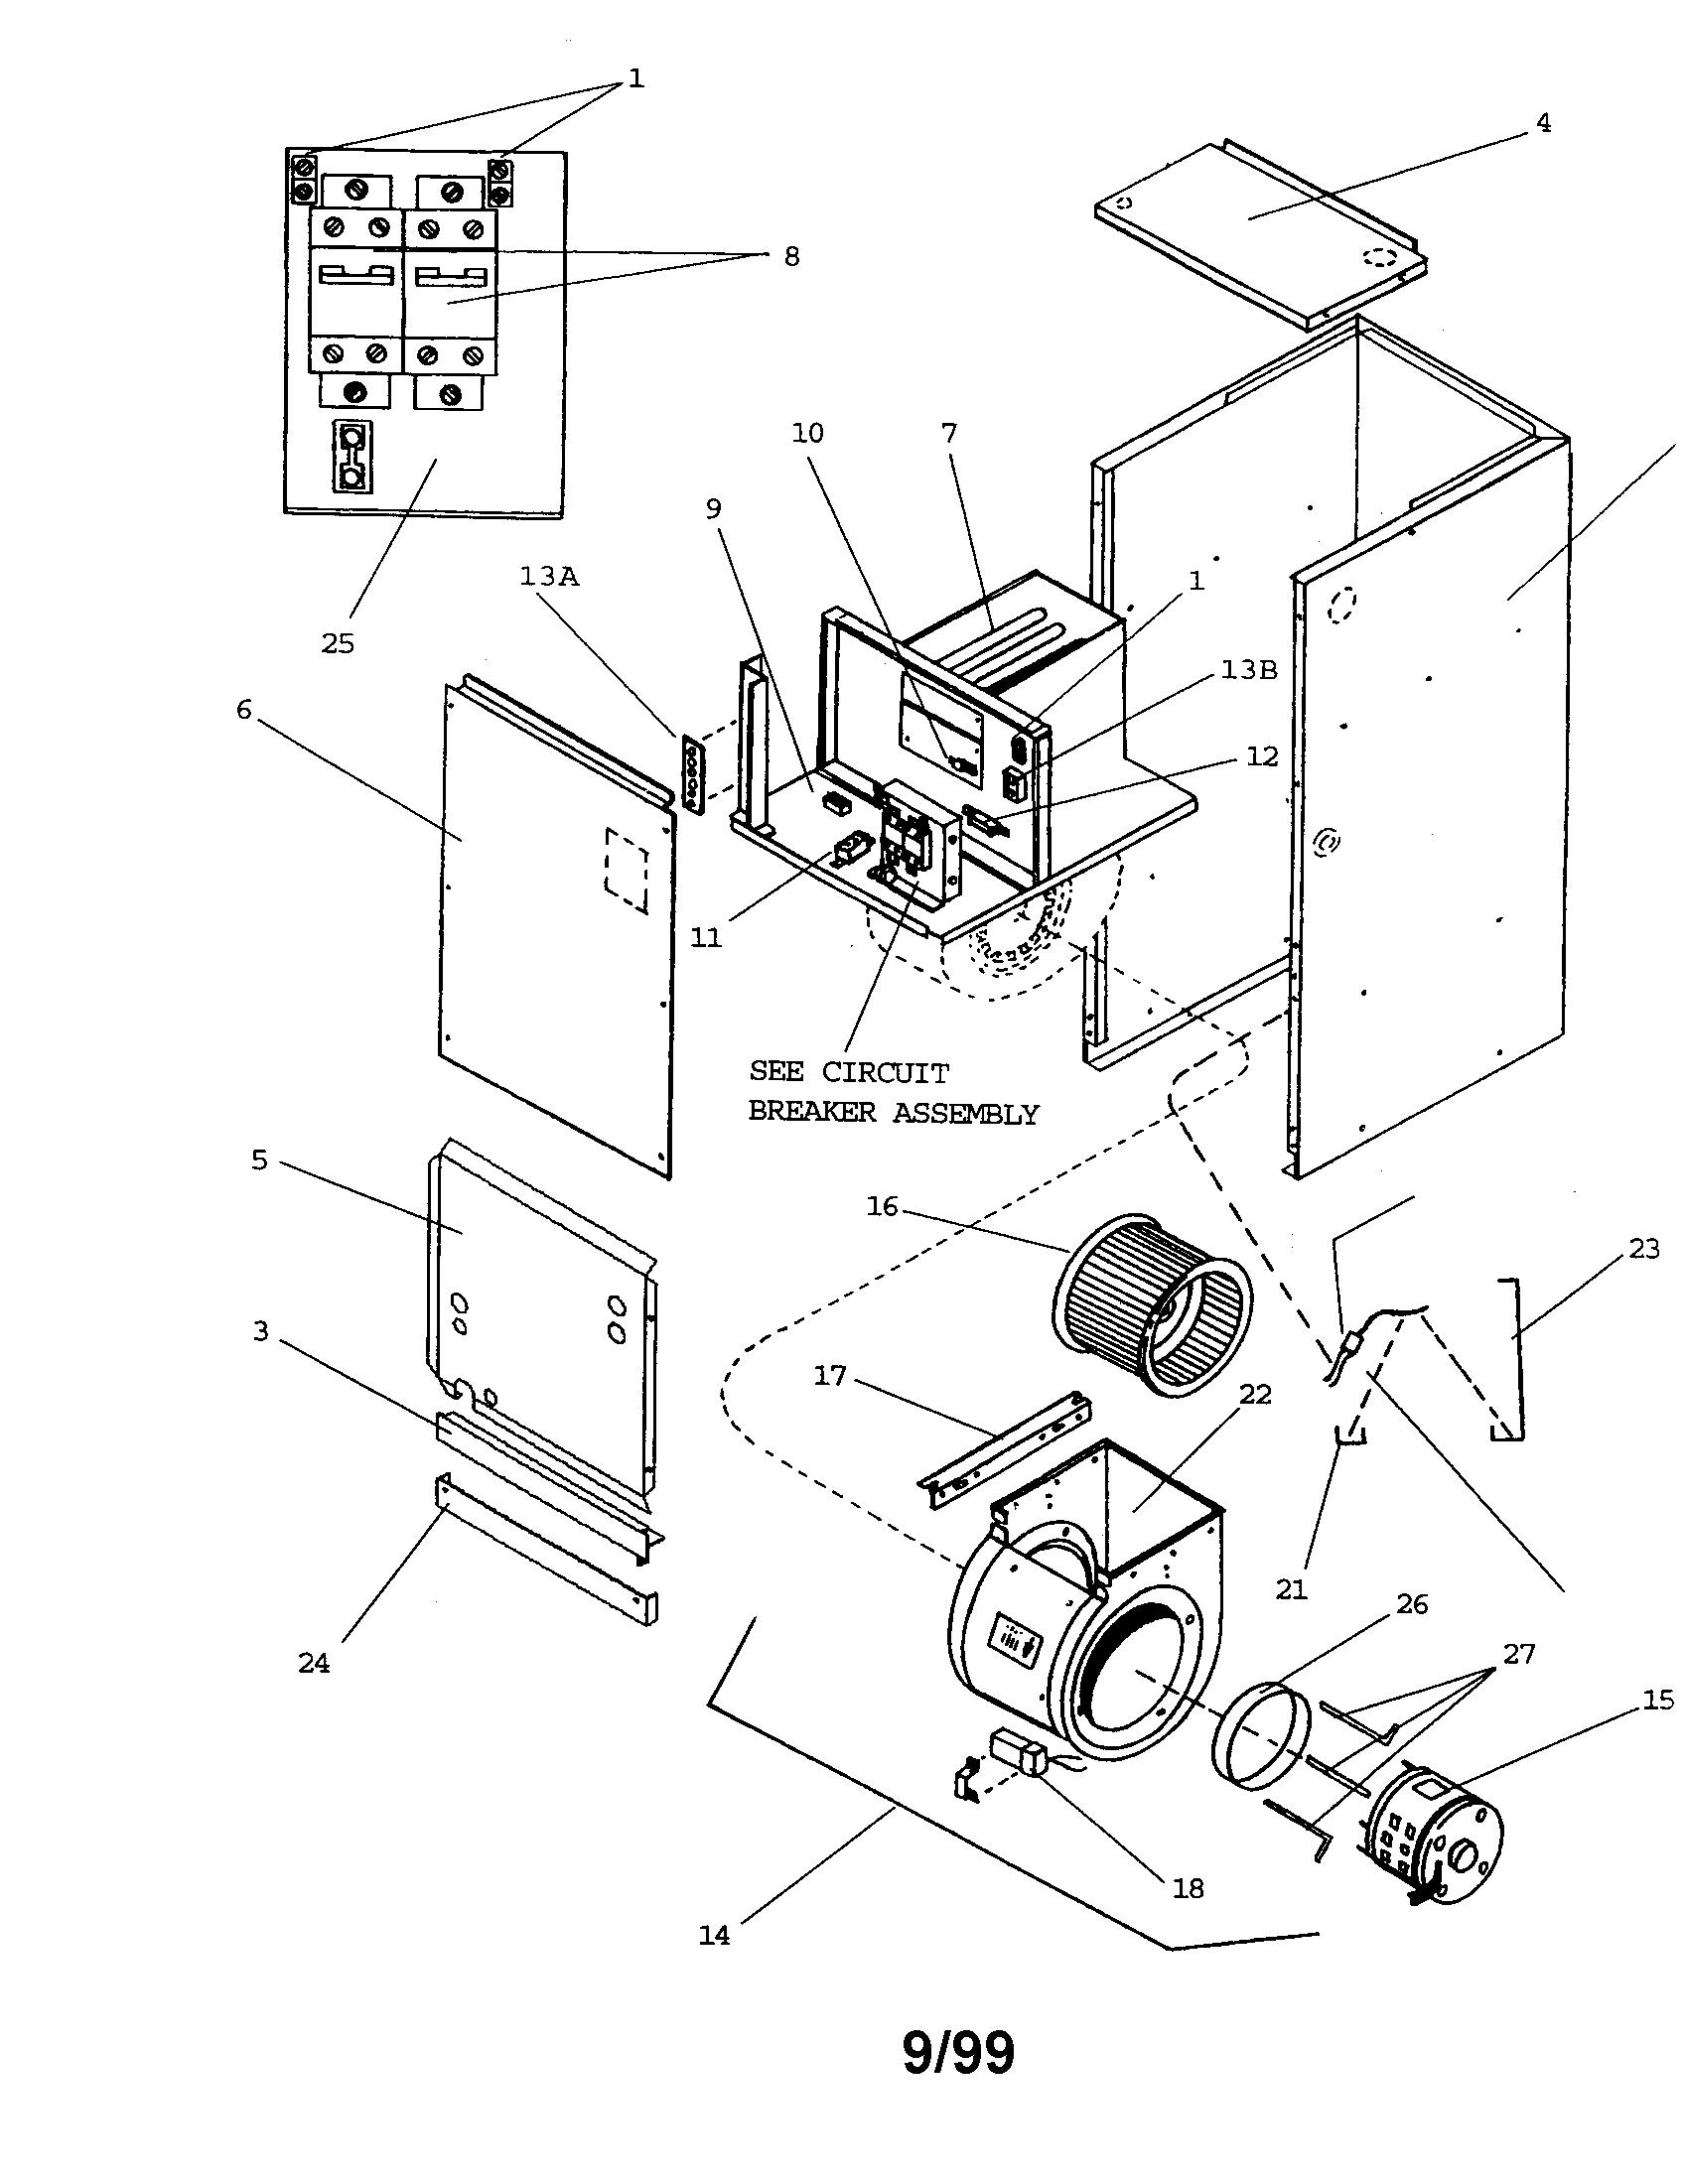 Dt Goodman Air Handler Wiring Diagrams File Name